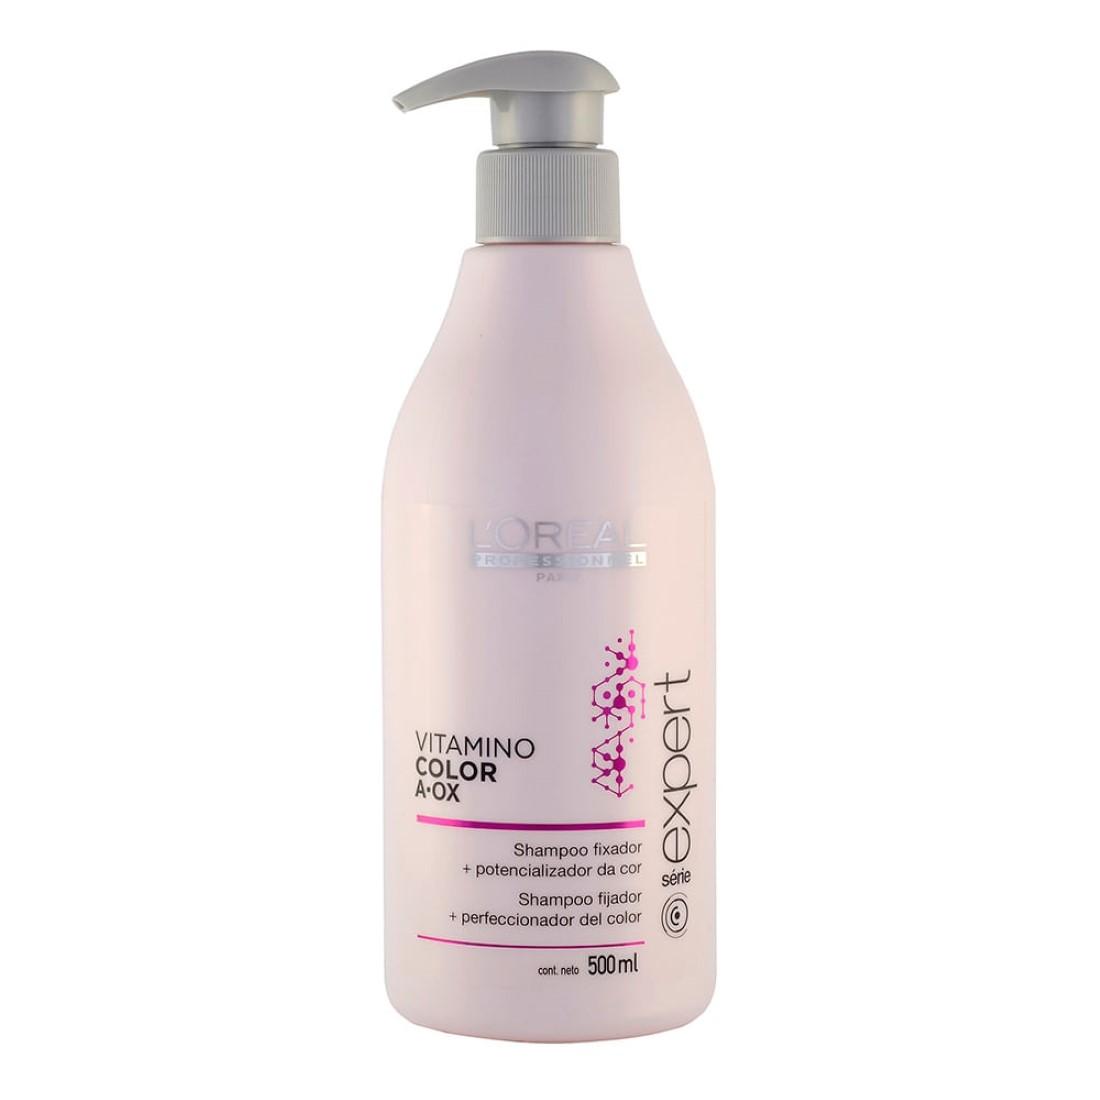 Shampoo Fixador + Potencializador da Cor Vitamino Color A?OX 500ml - L'Oréal Professionnel